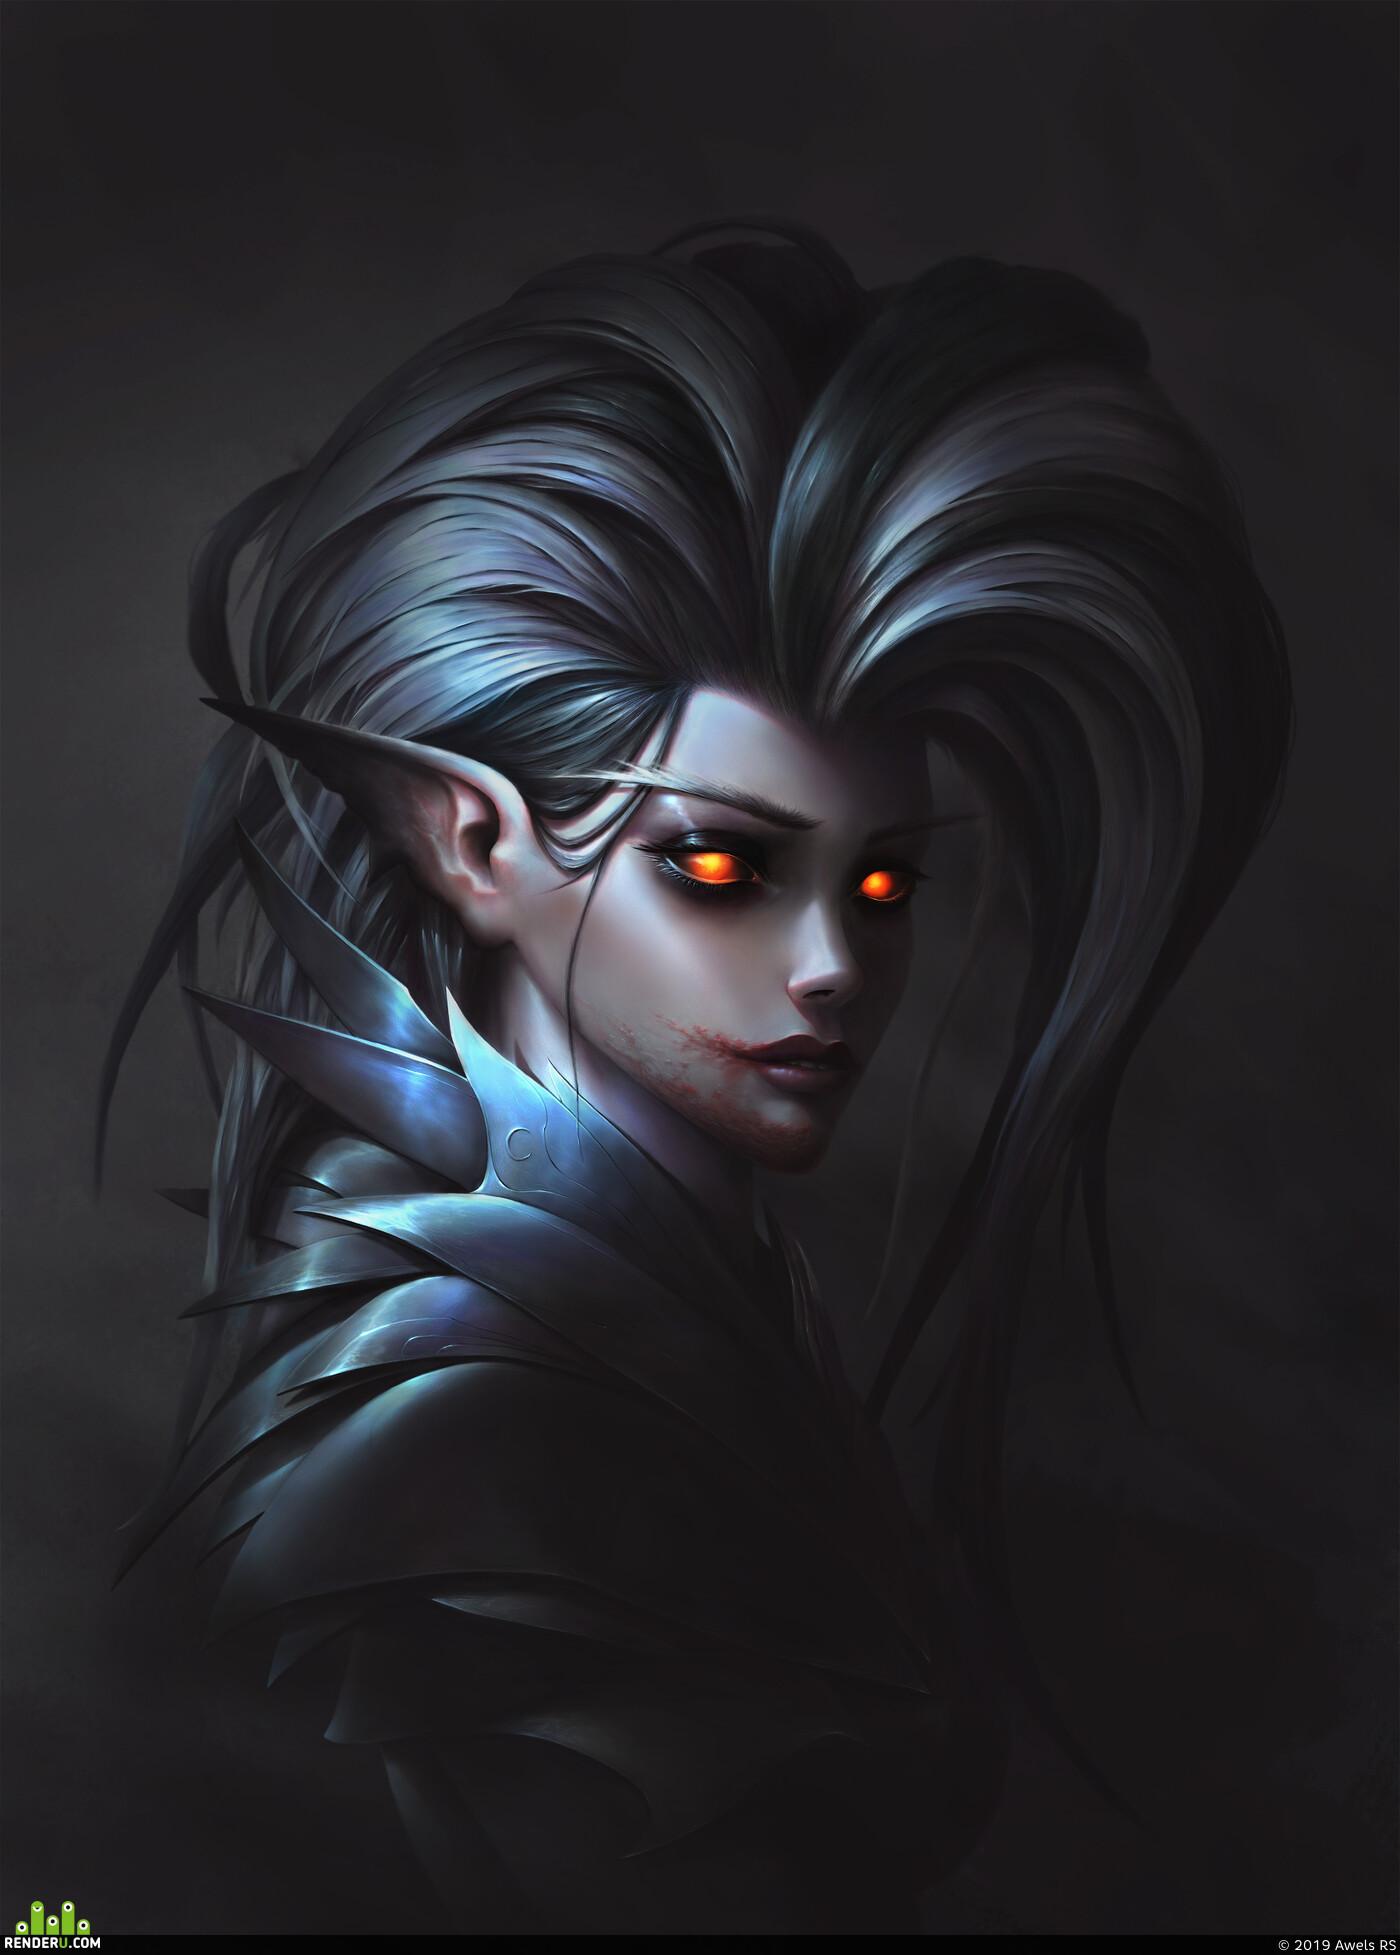 elf, elfgirl, awels, RS, awelsrs, Fantasy, woman, art, illustration, warcraft